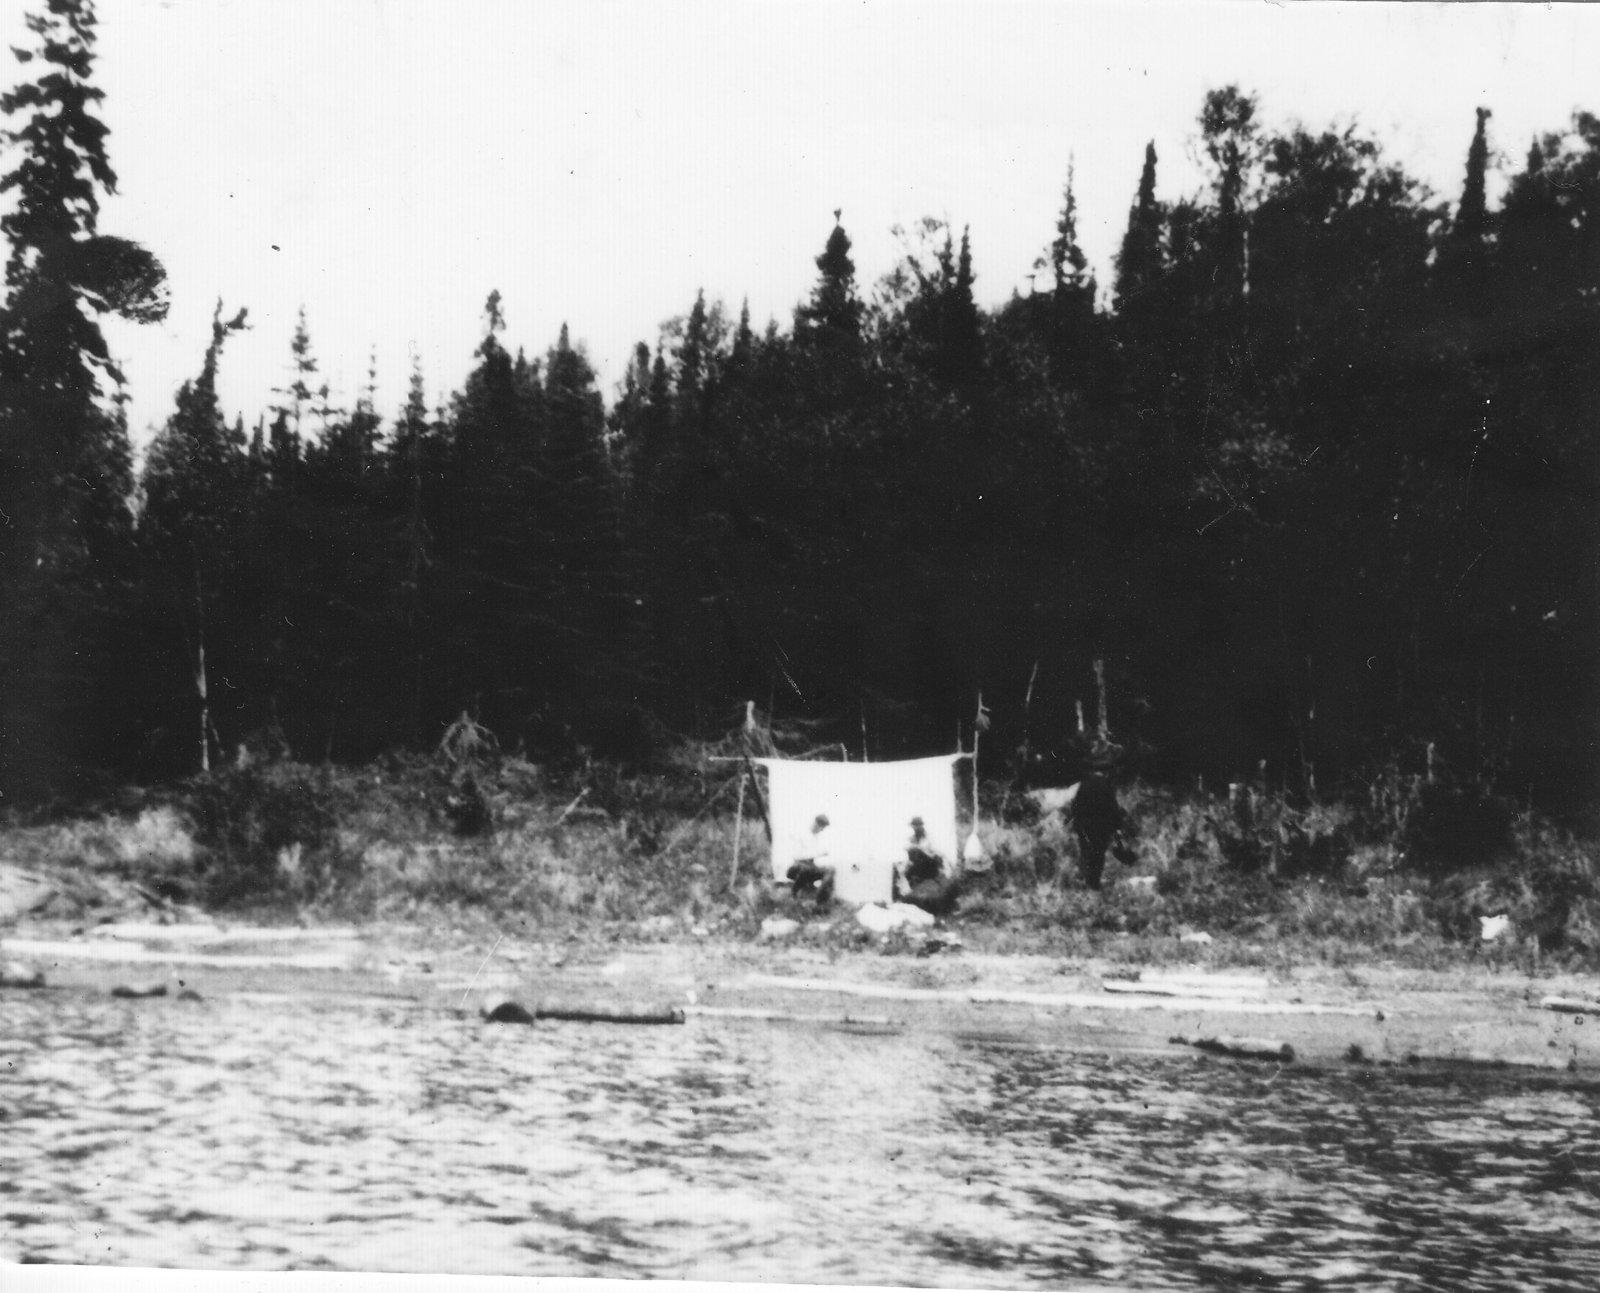 Camp in Otter Cove - 1920's